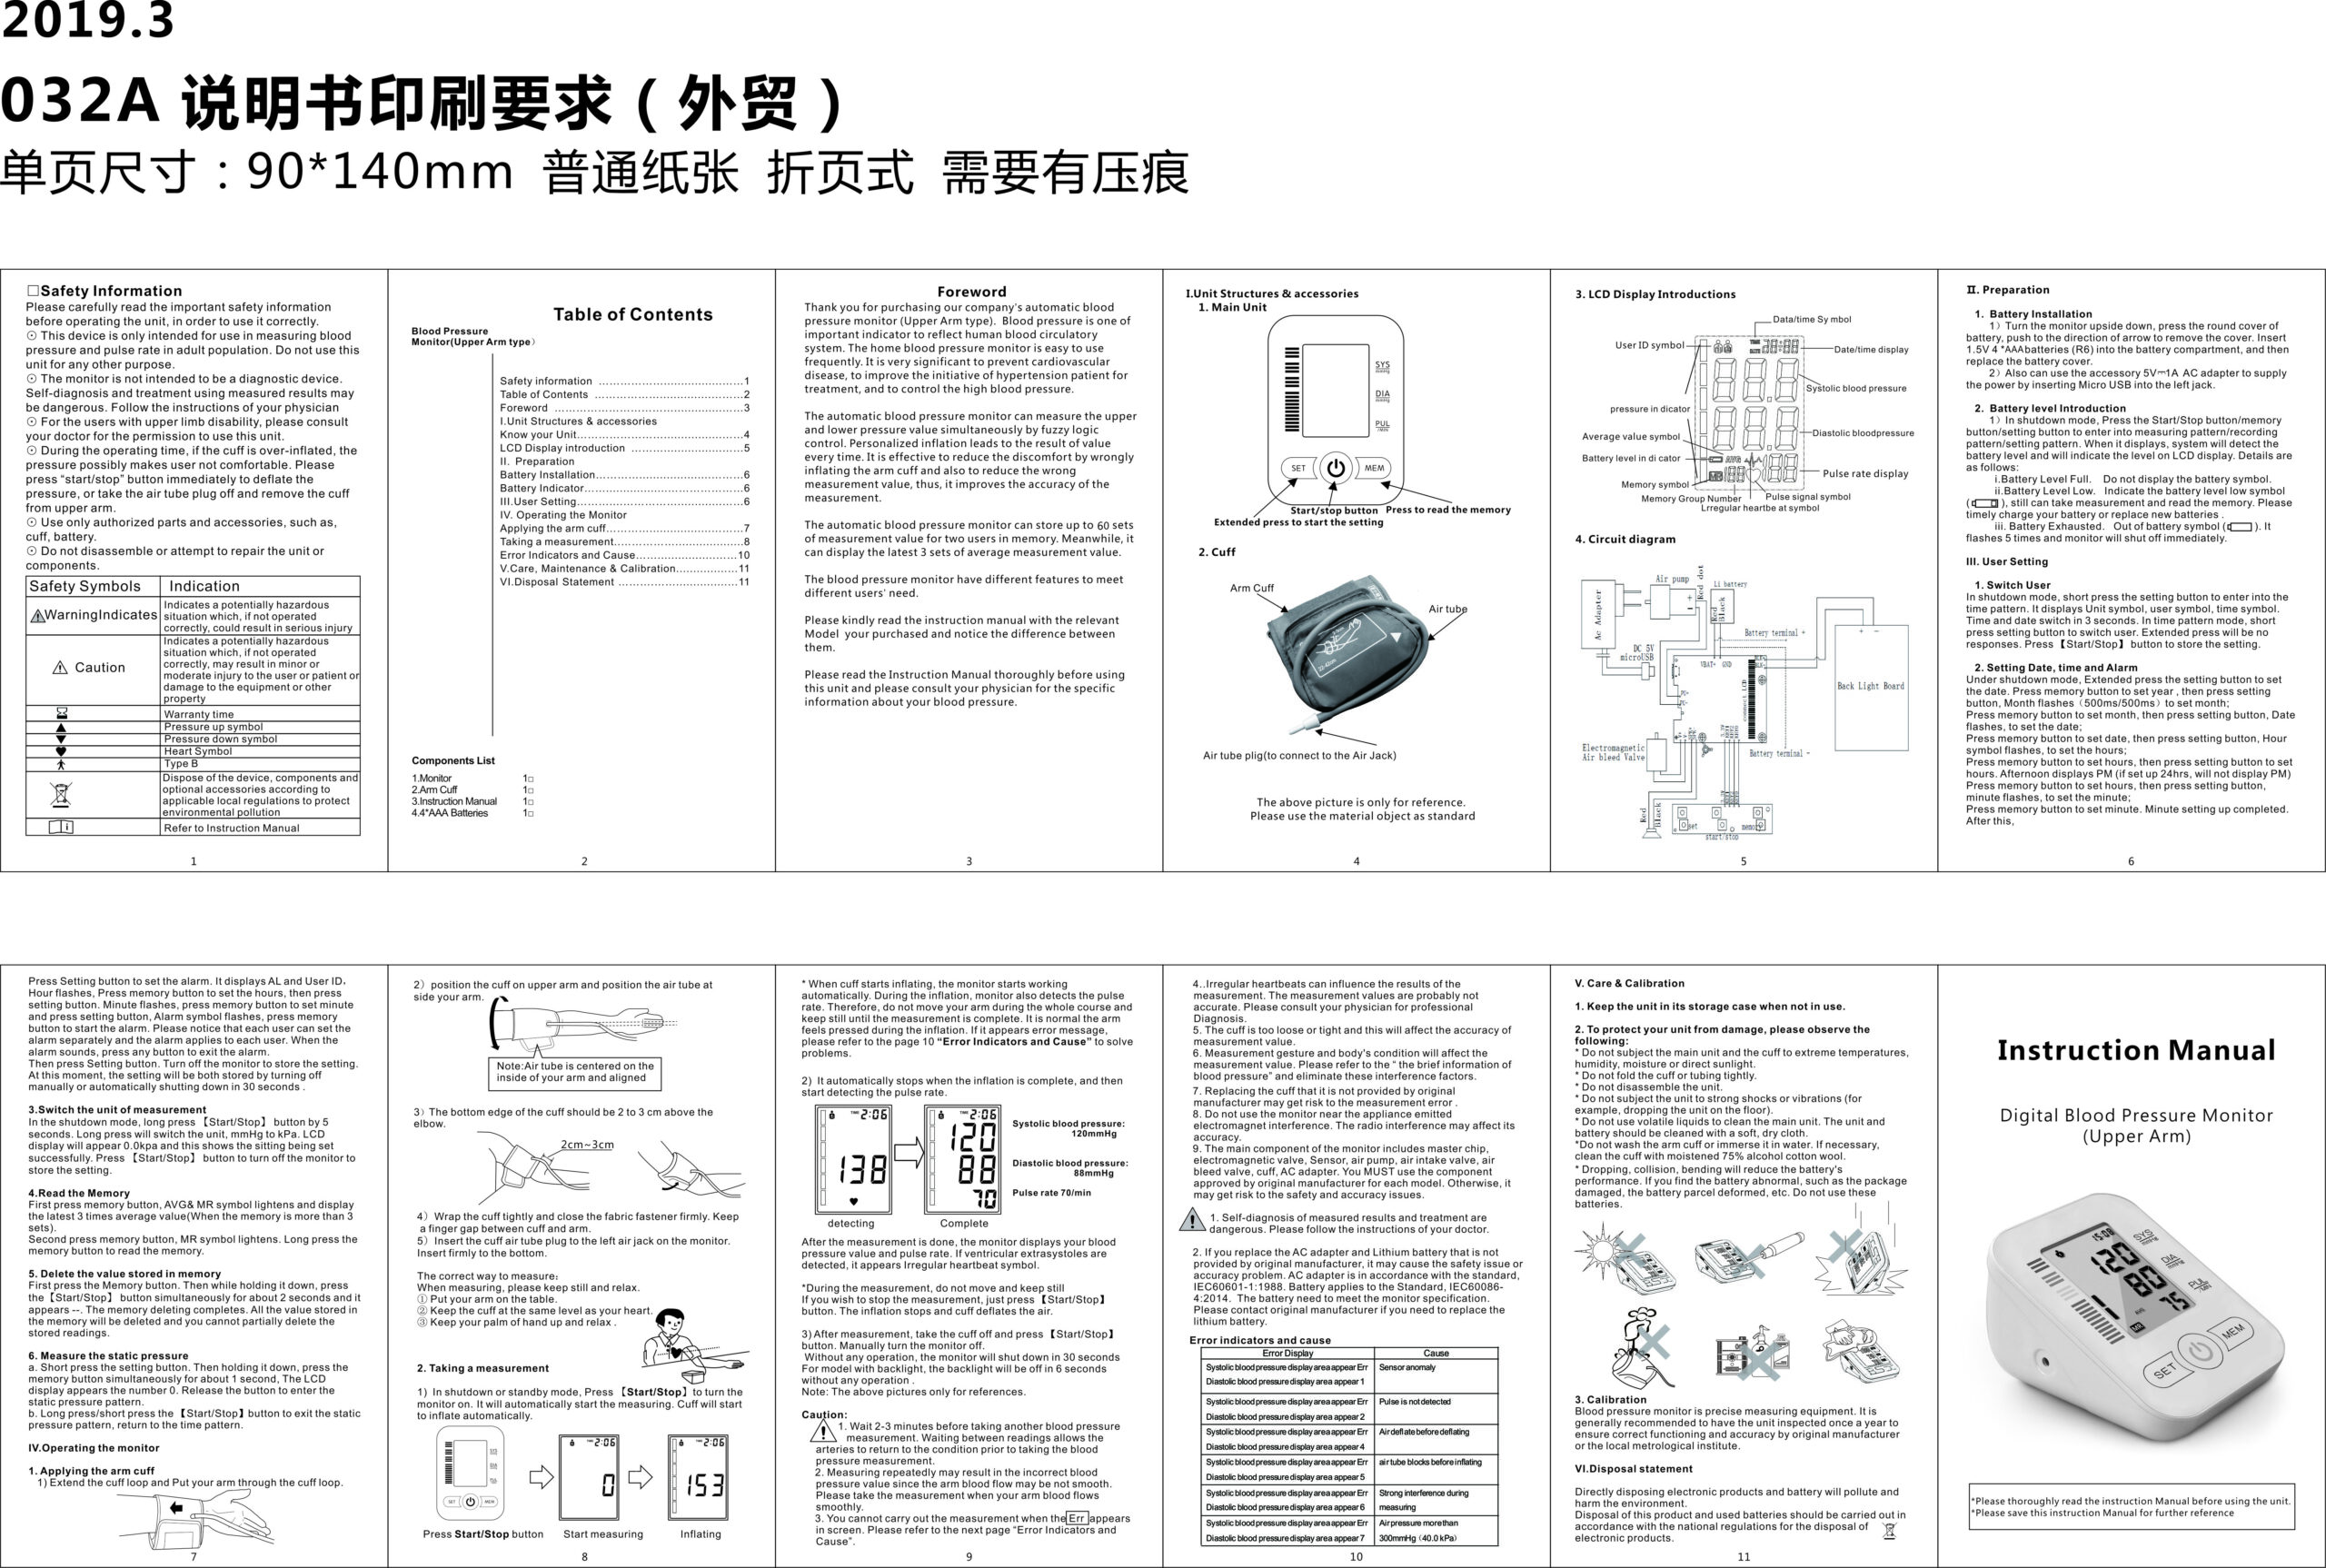 RN-32A user manual